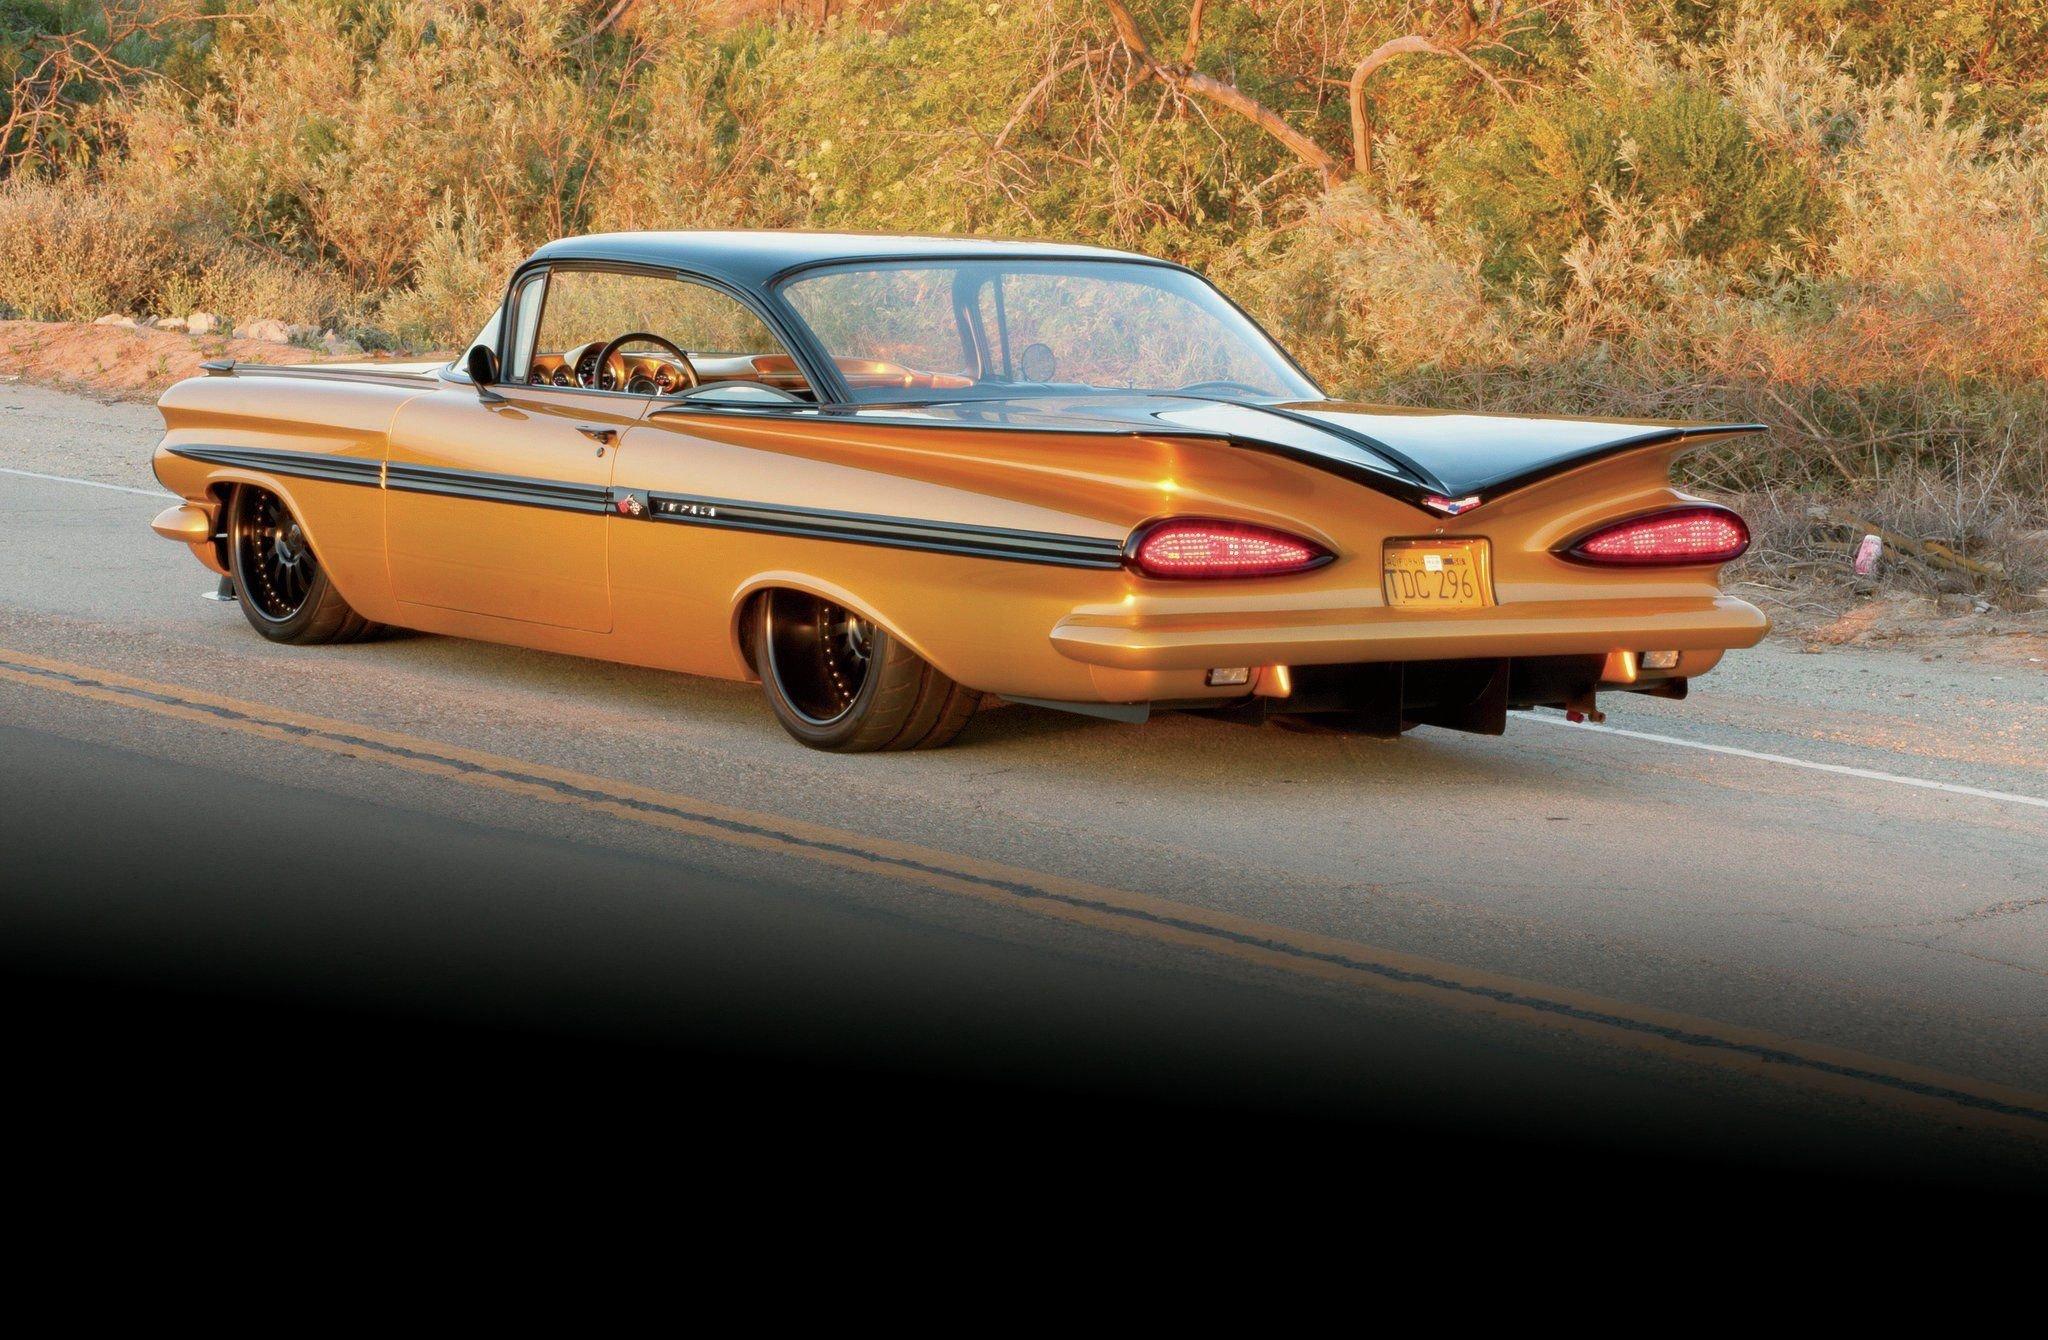 1959 Chevrolet Impala Hardtop-04 wallpaper